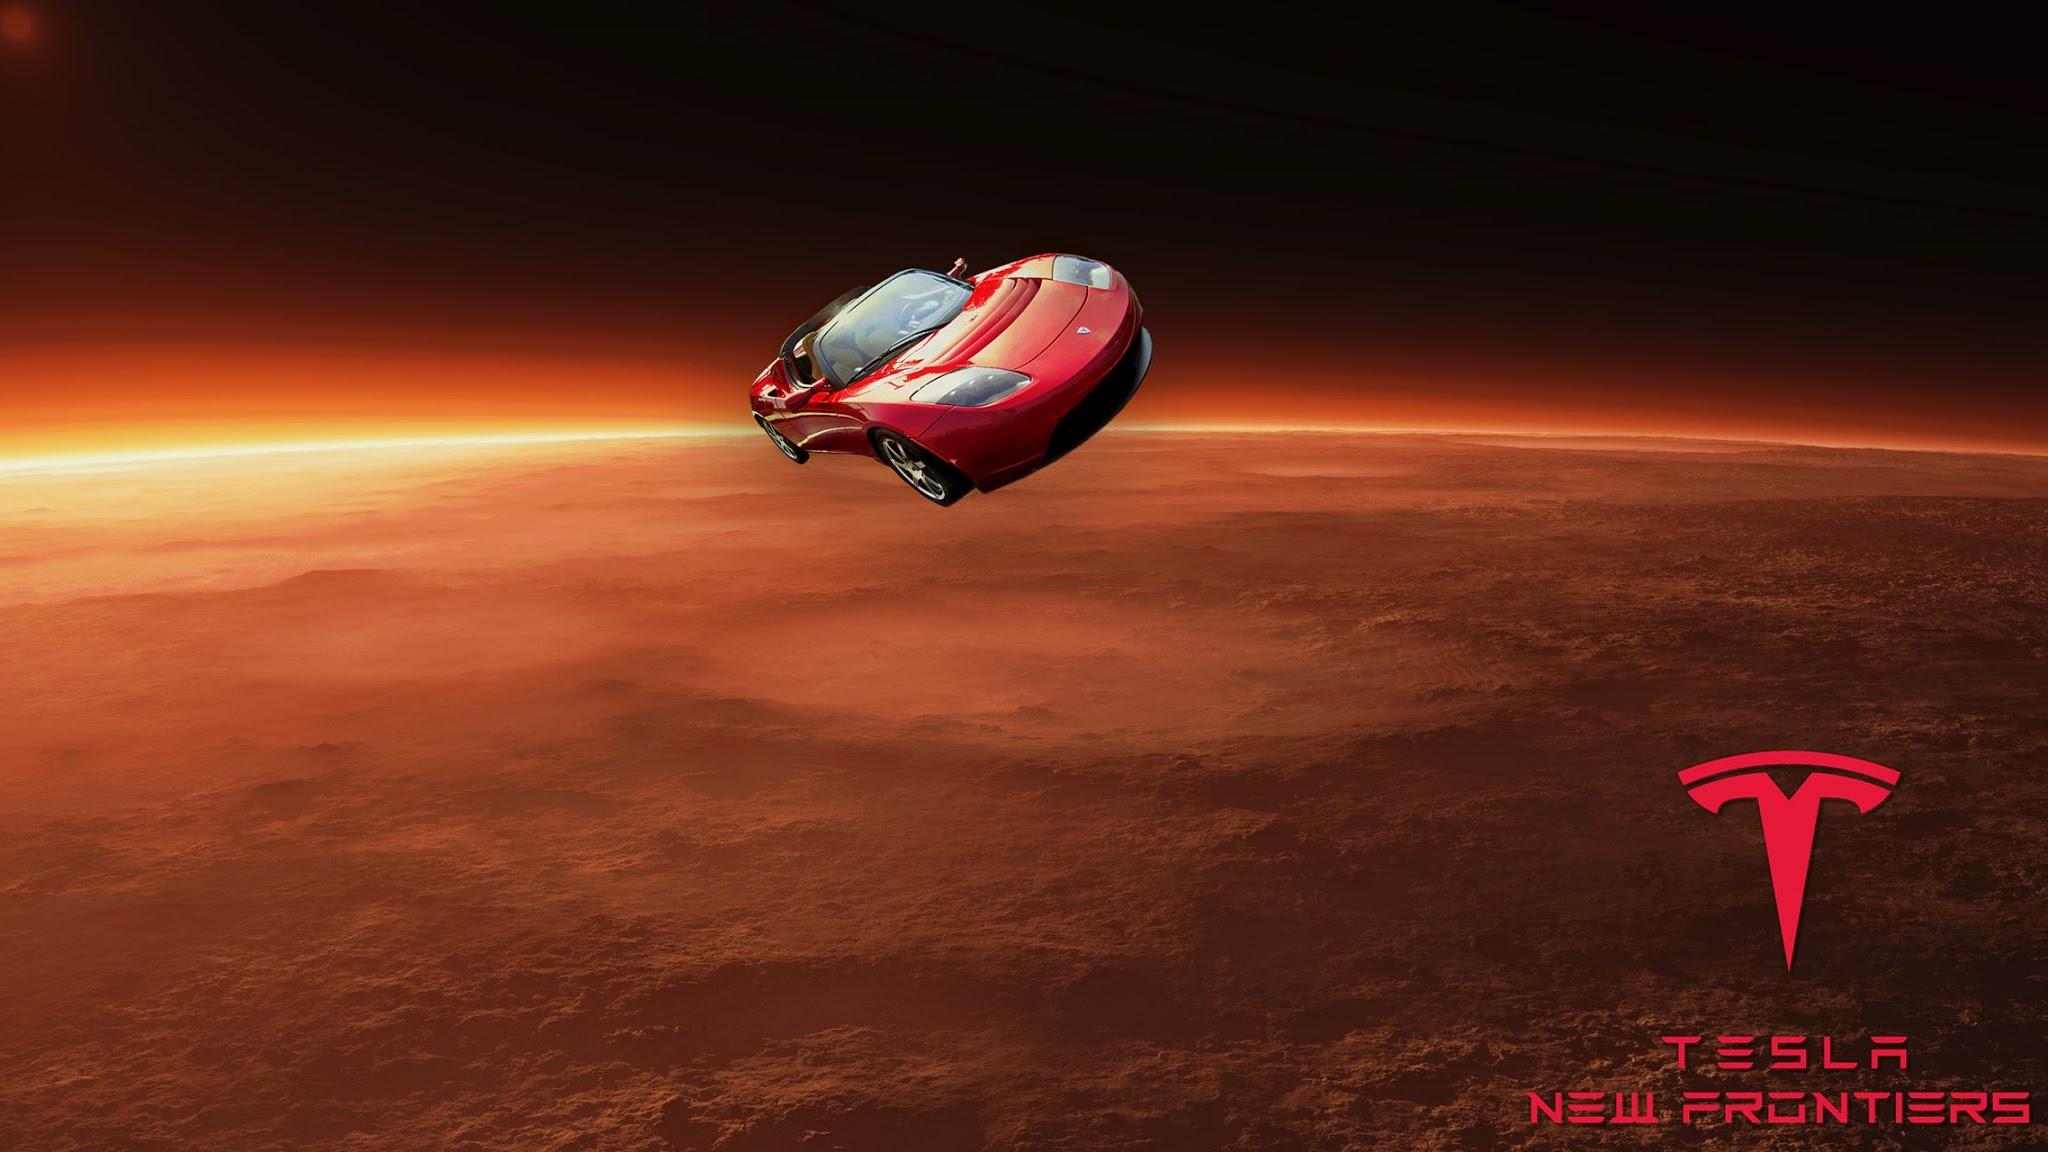 Deep Space Roadster traveling to Mars   human Mars